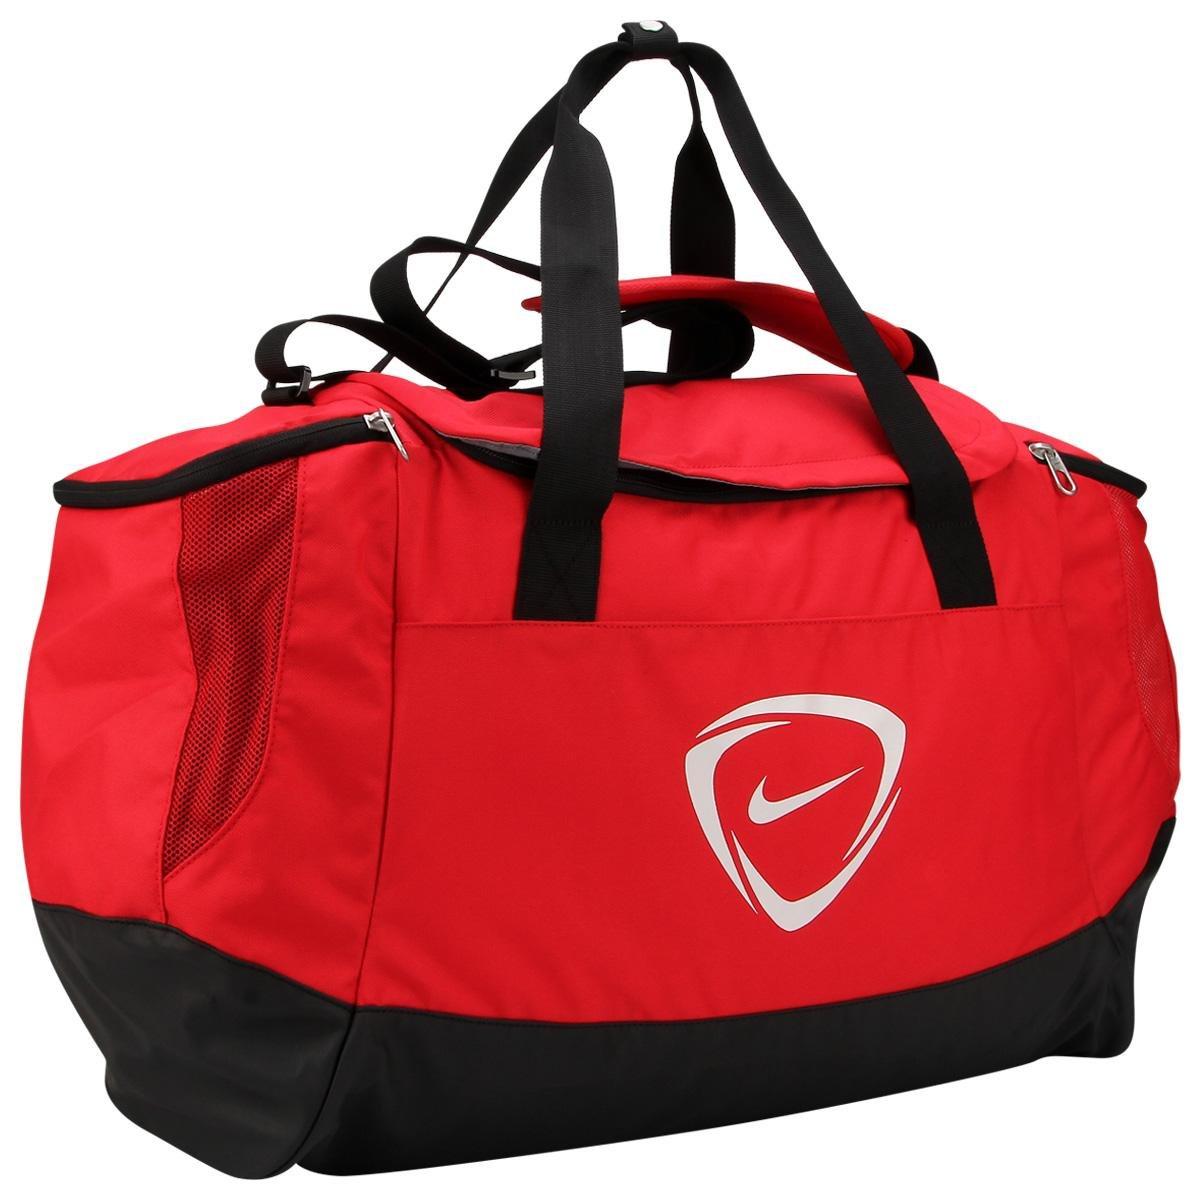 c10fdfedf Mala Nike Football Club Team - Compre Agora | Netshoes